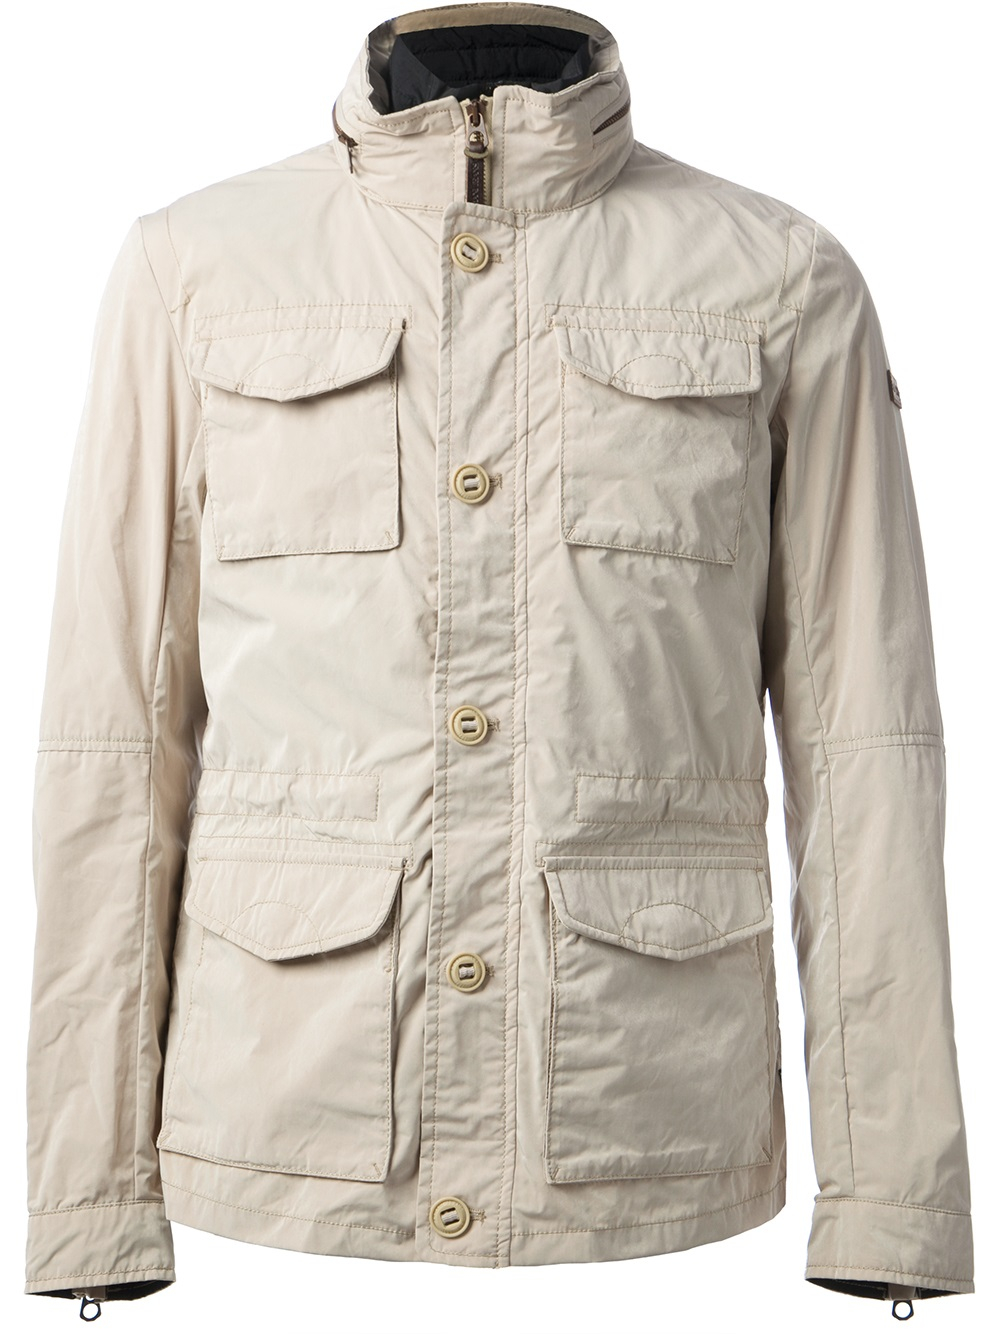 Armani Jeans Layered Field Jacket In Beige For Men Nude